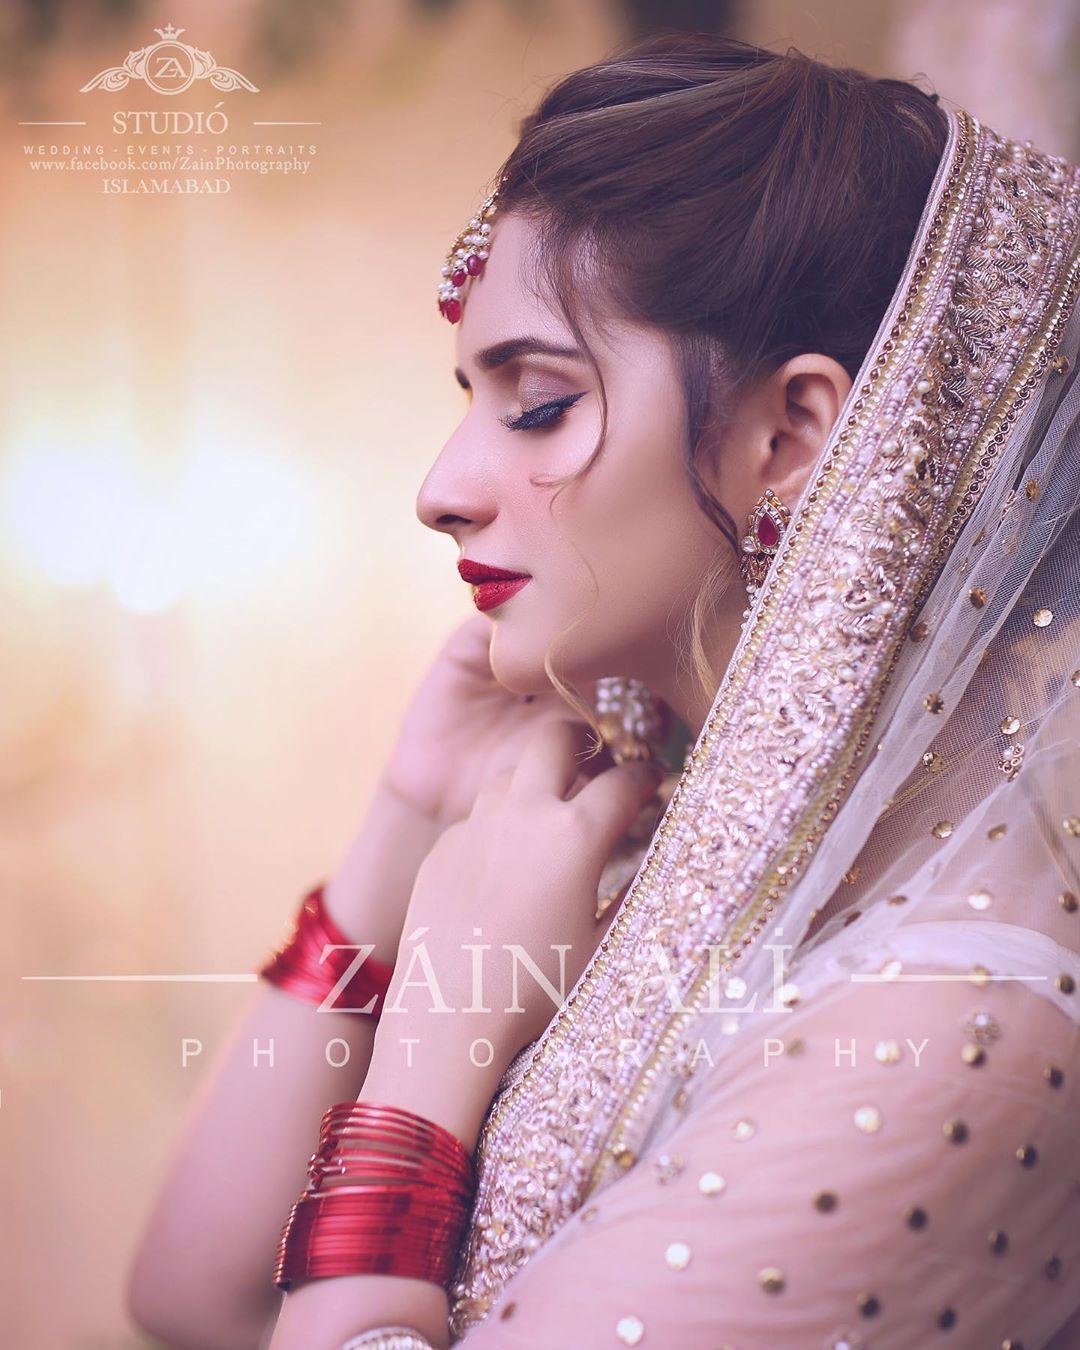 Tiktok Star Sisters Jannat Mirza and Alishba Anjum Bridal Photo Shoot